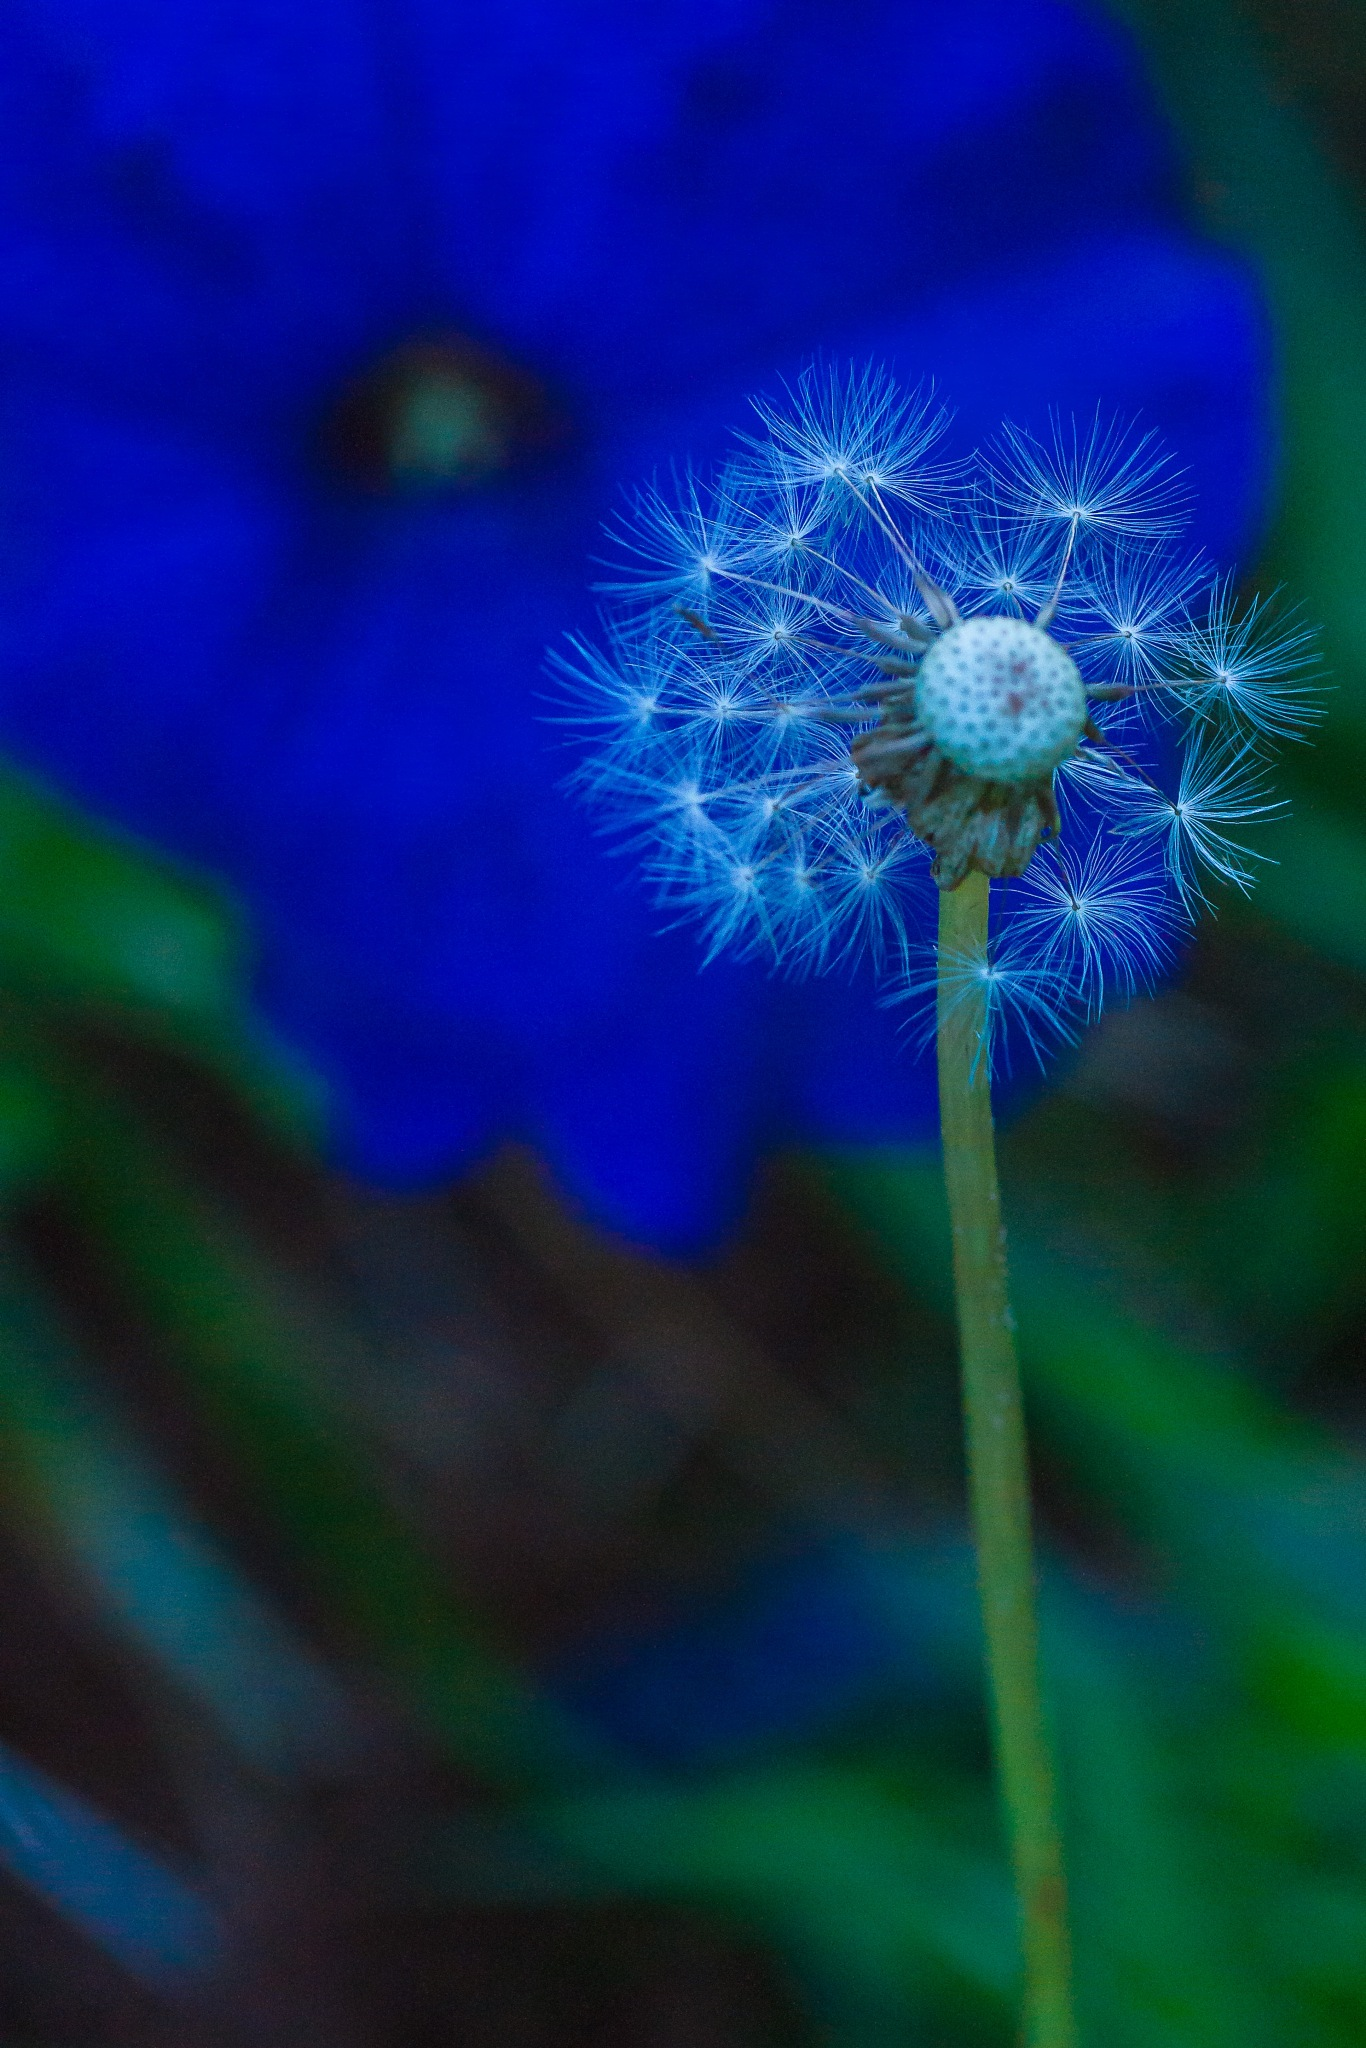 Star seeds by Hervé Samson